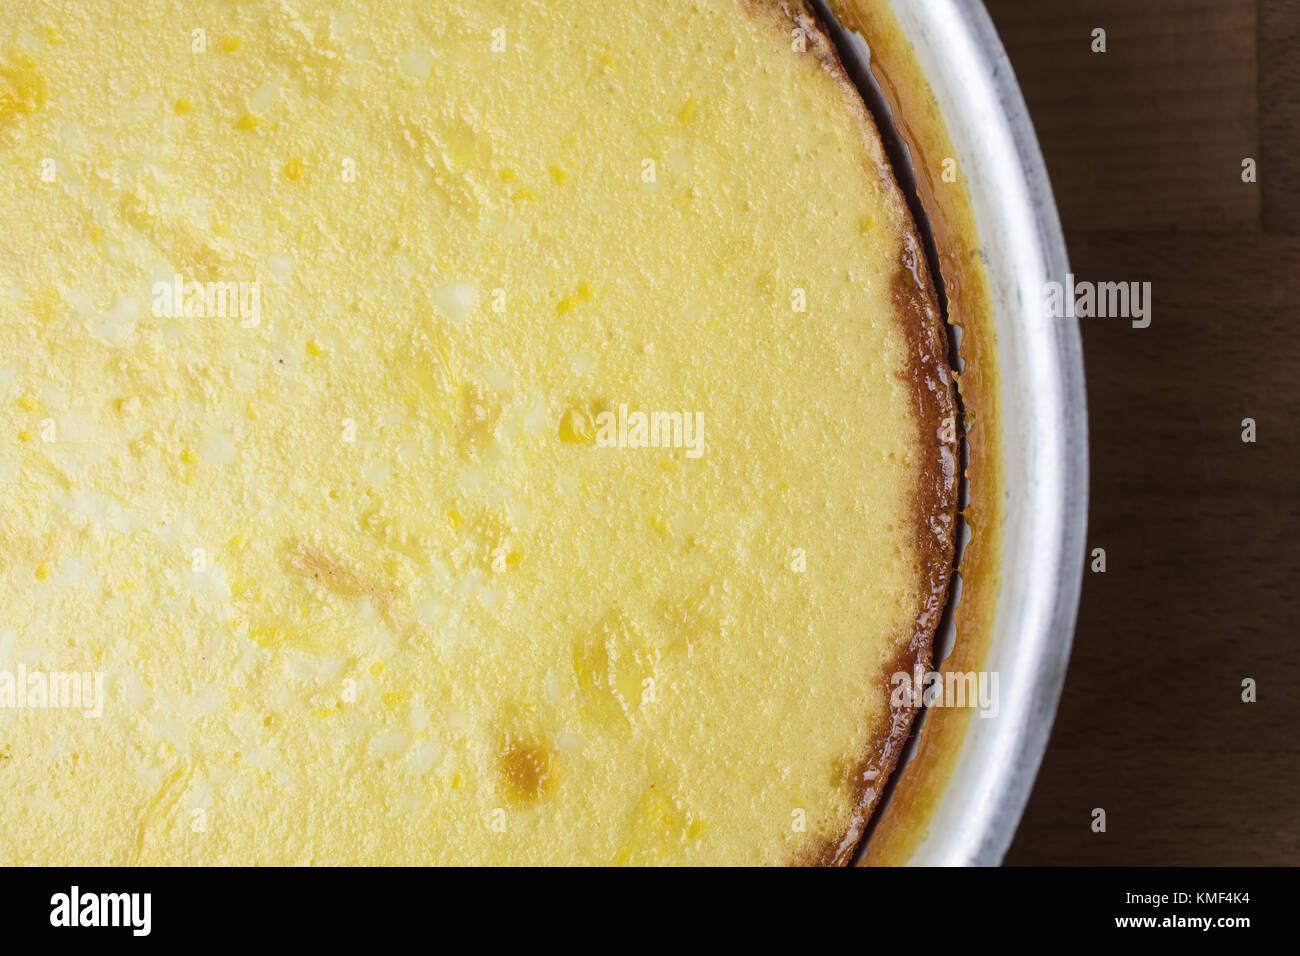 Process of making an egg flan dessert for baking - Stock Image